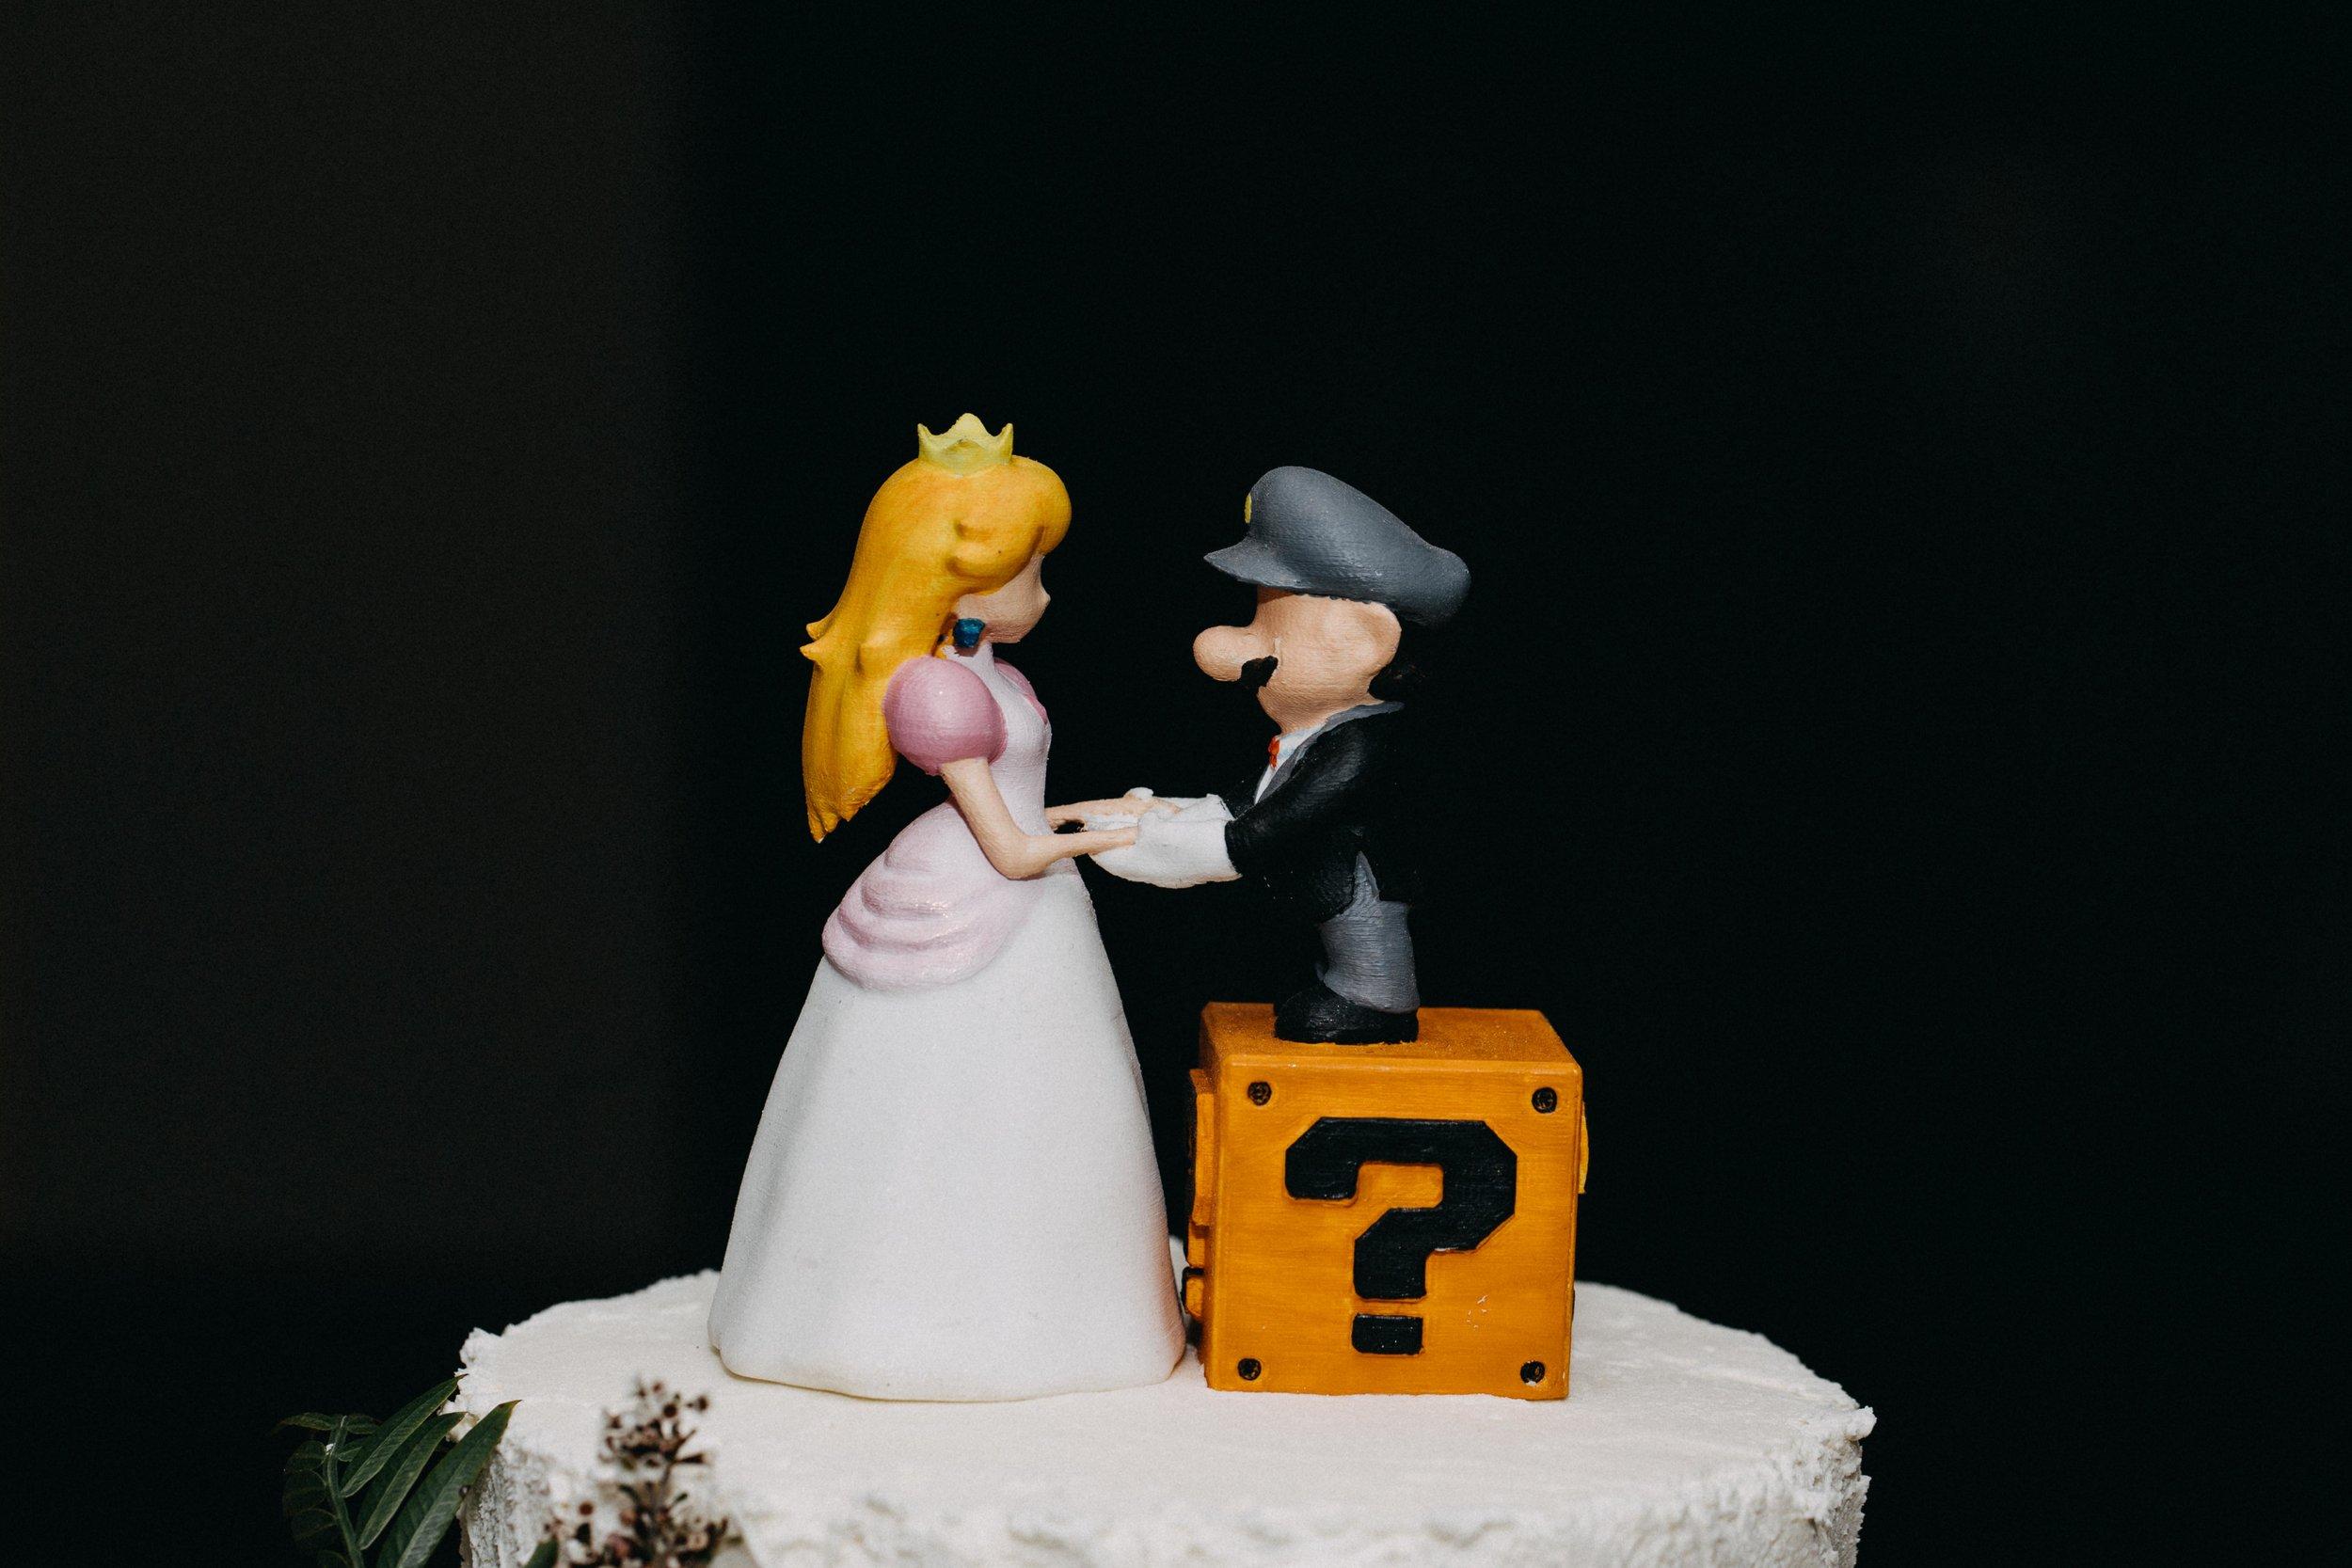 appin-house-wedding-macarthur-www.emilyobrienphotography.net-57.jpg